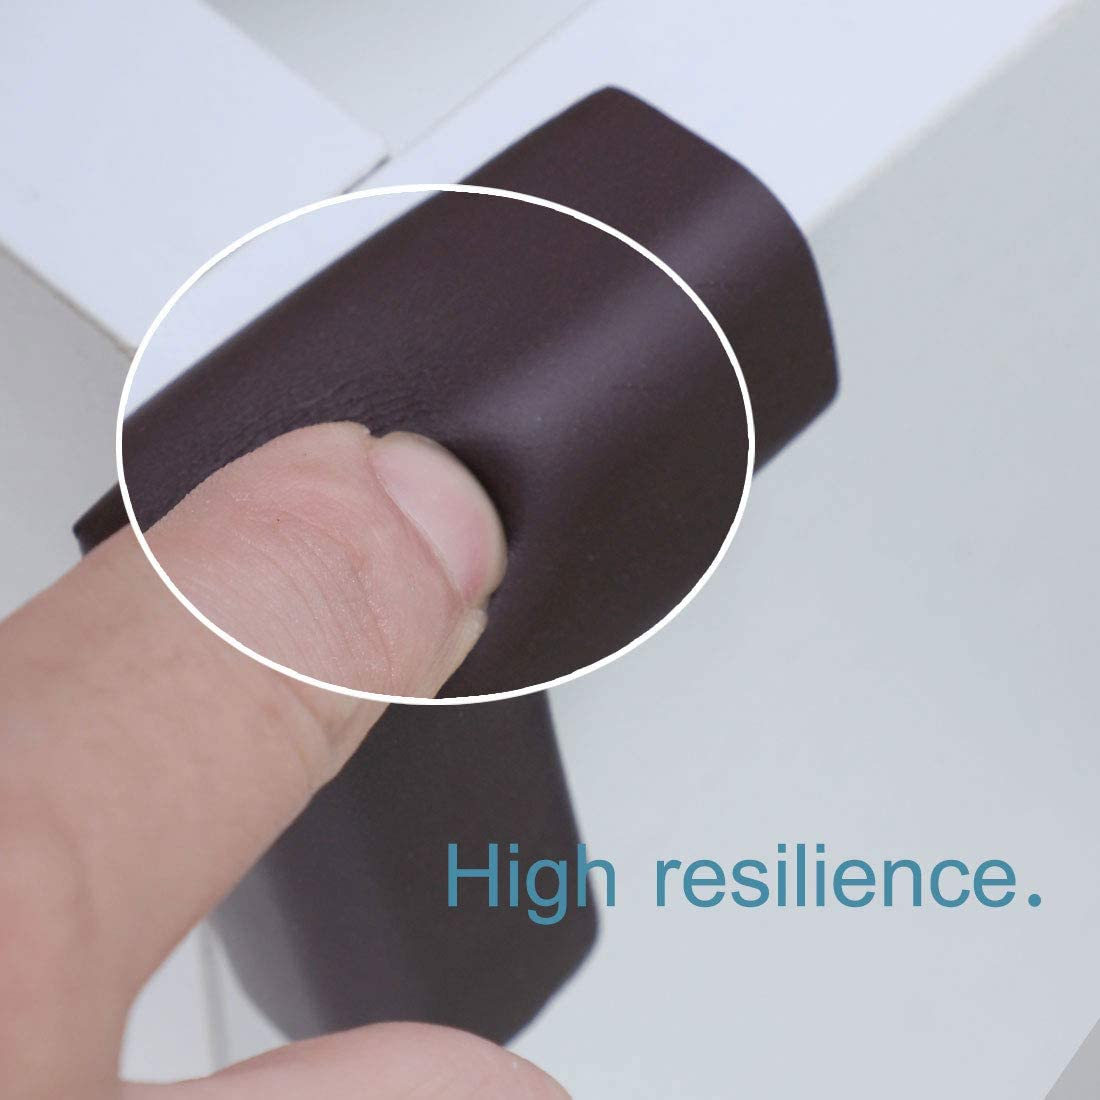 uxcell 4pcs Foam Furniture Desks Table Edge Cover Pads Protectors Corner Cushions Bumpers Guards Dark Brown